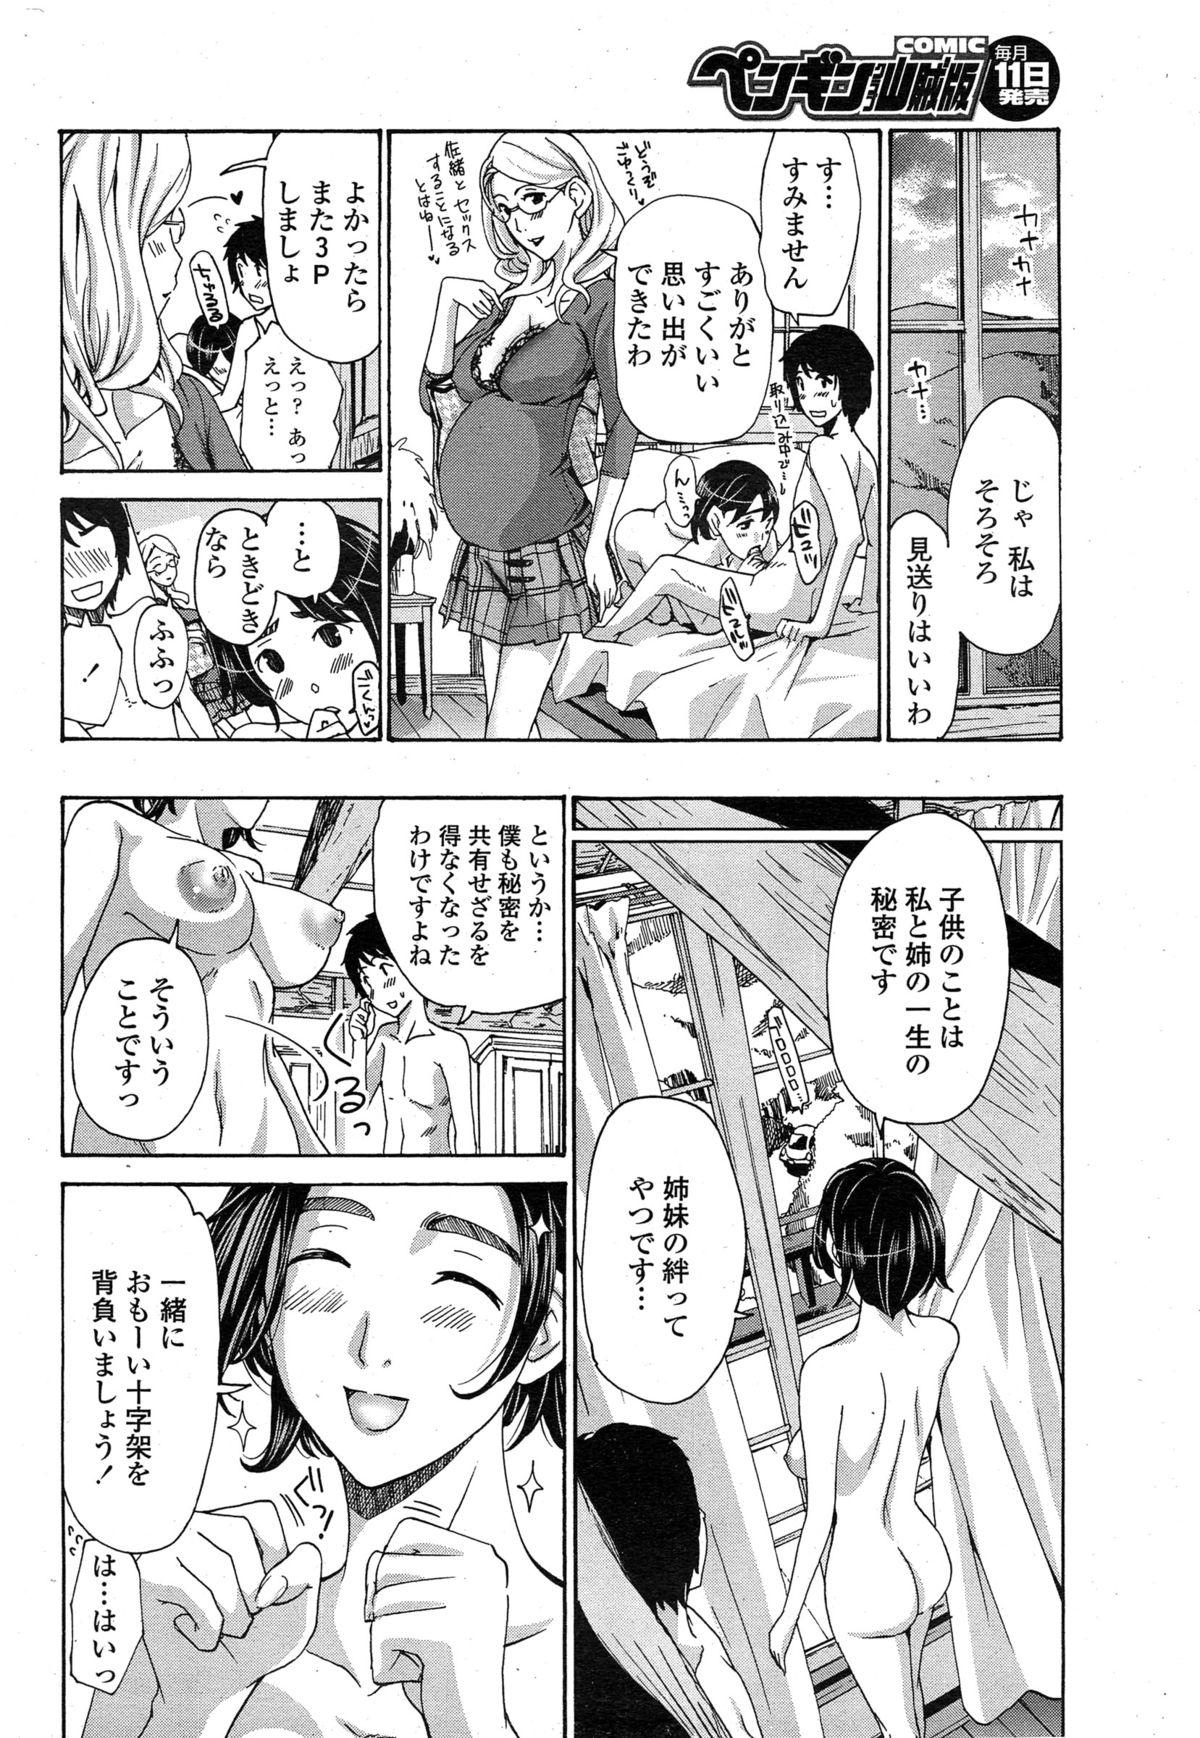 COMIC Penguin Club Sanzokuban 2014-12 47